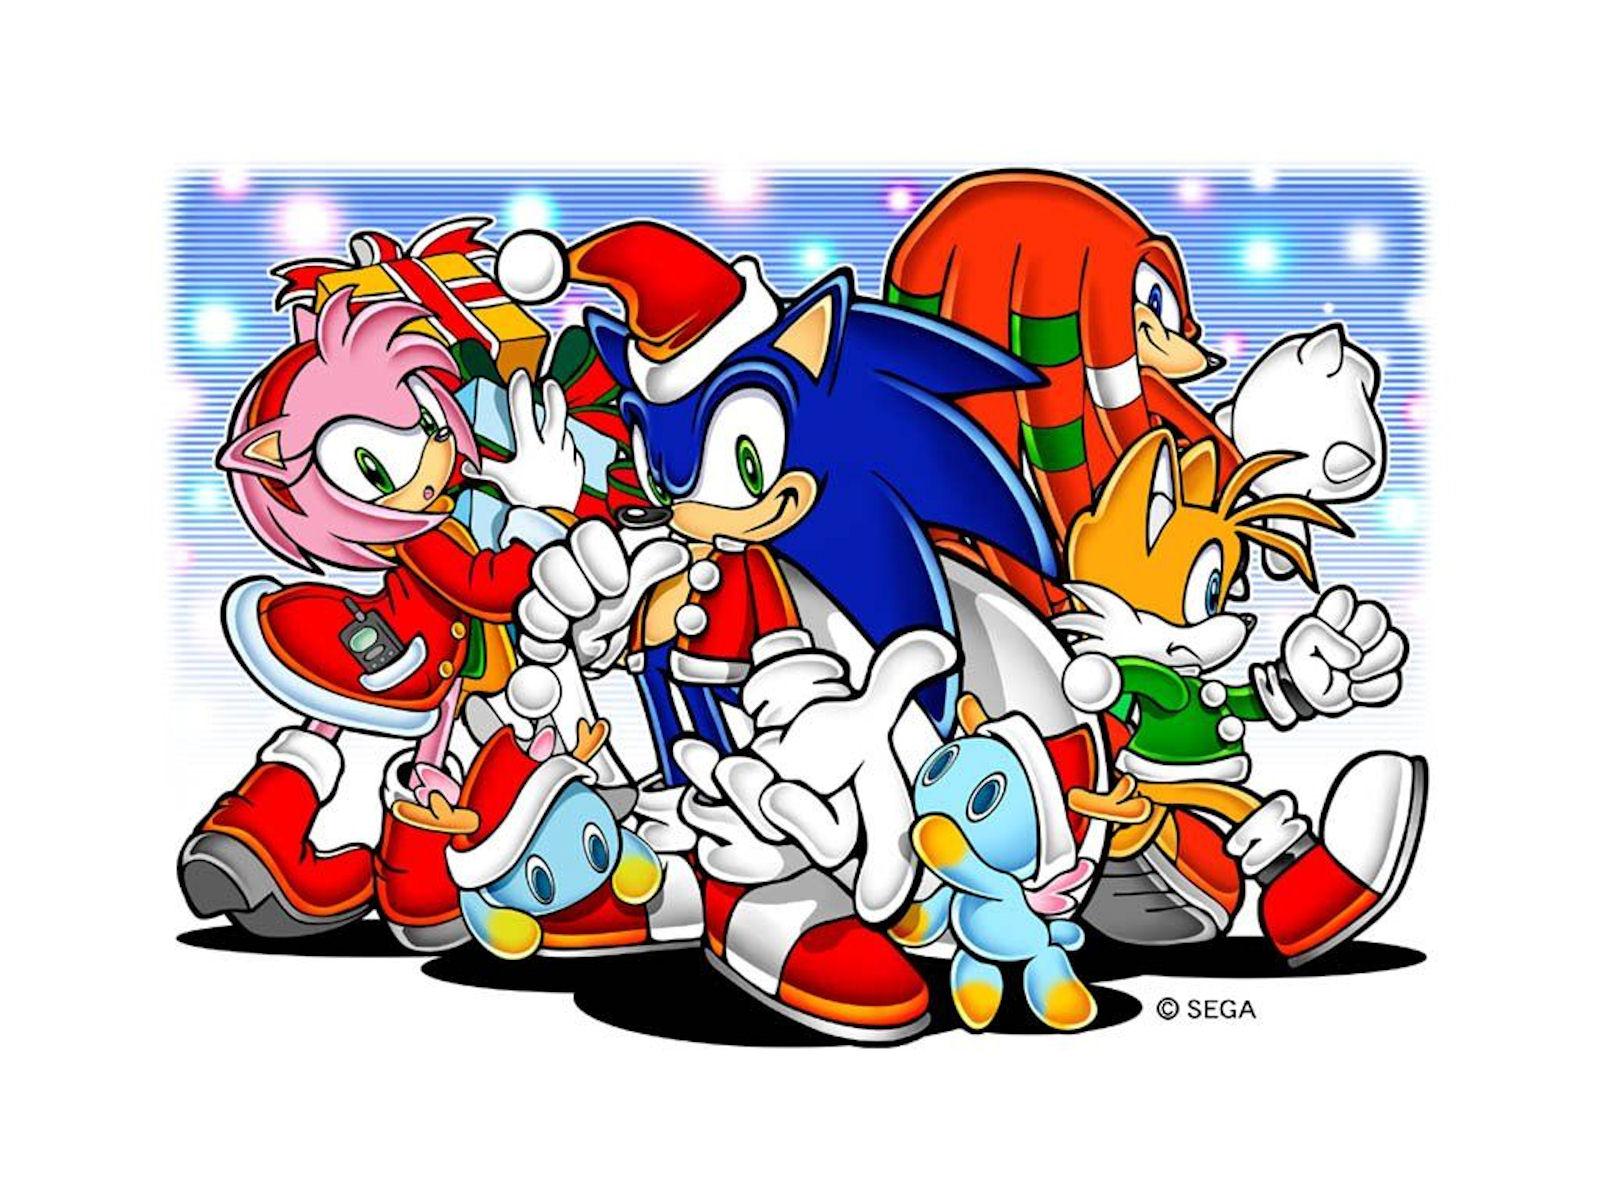 Sonic the Hedgehog Christmas Wallpaper